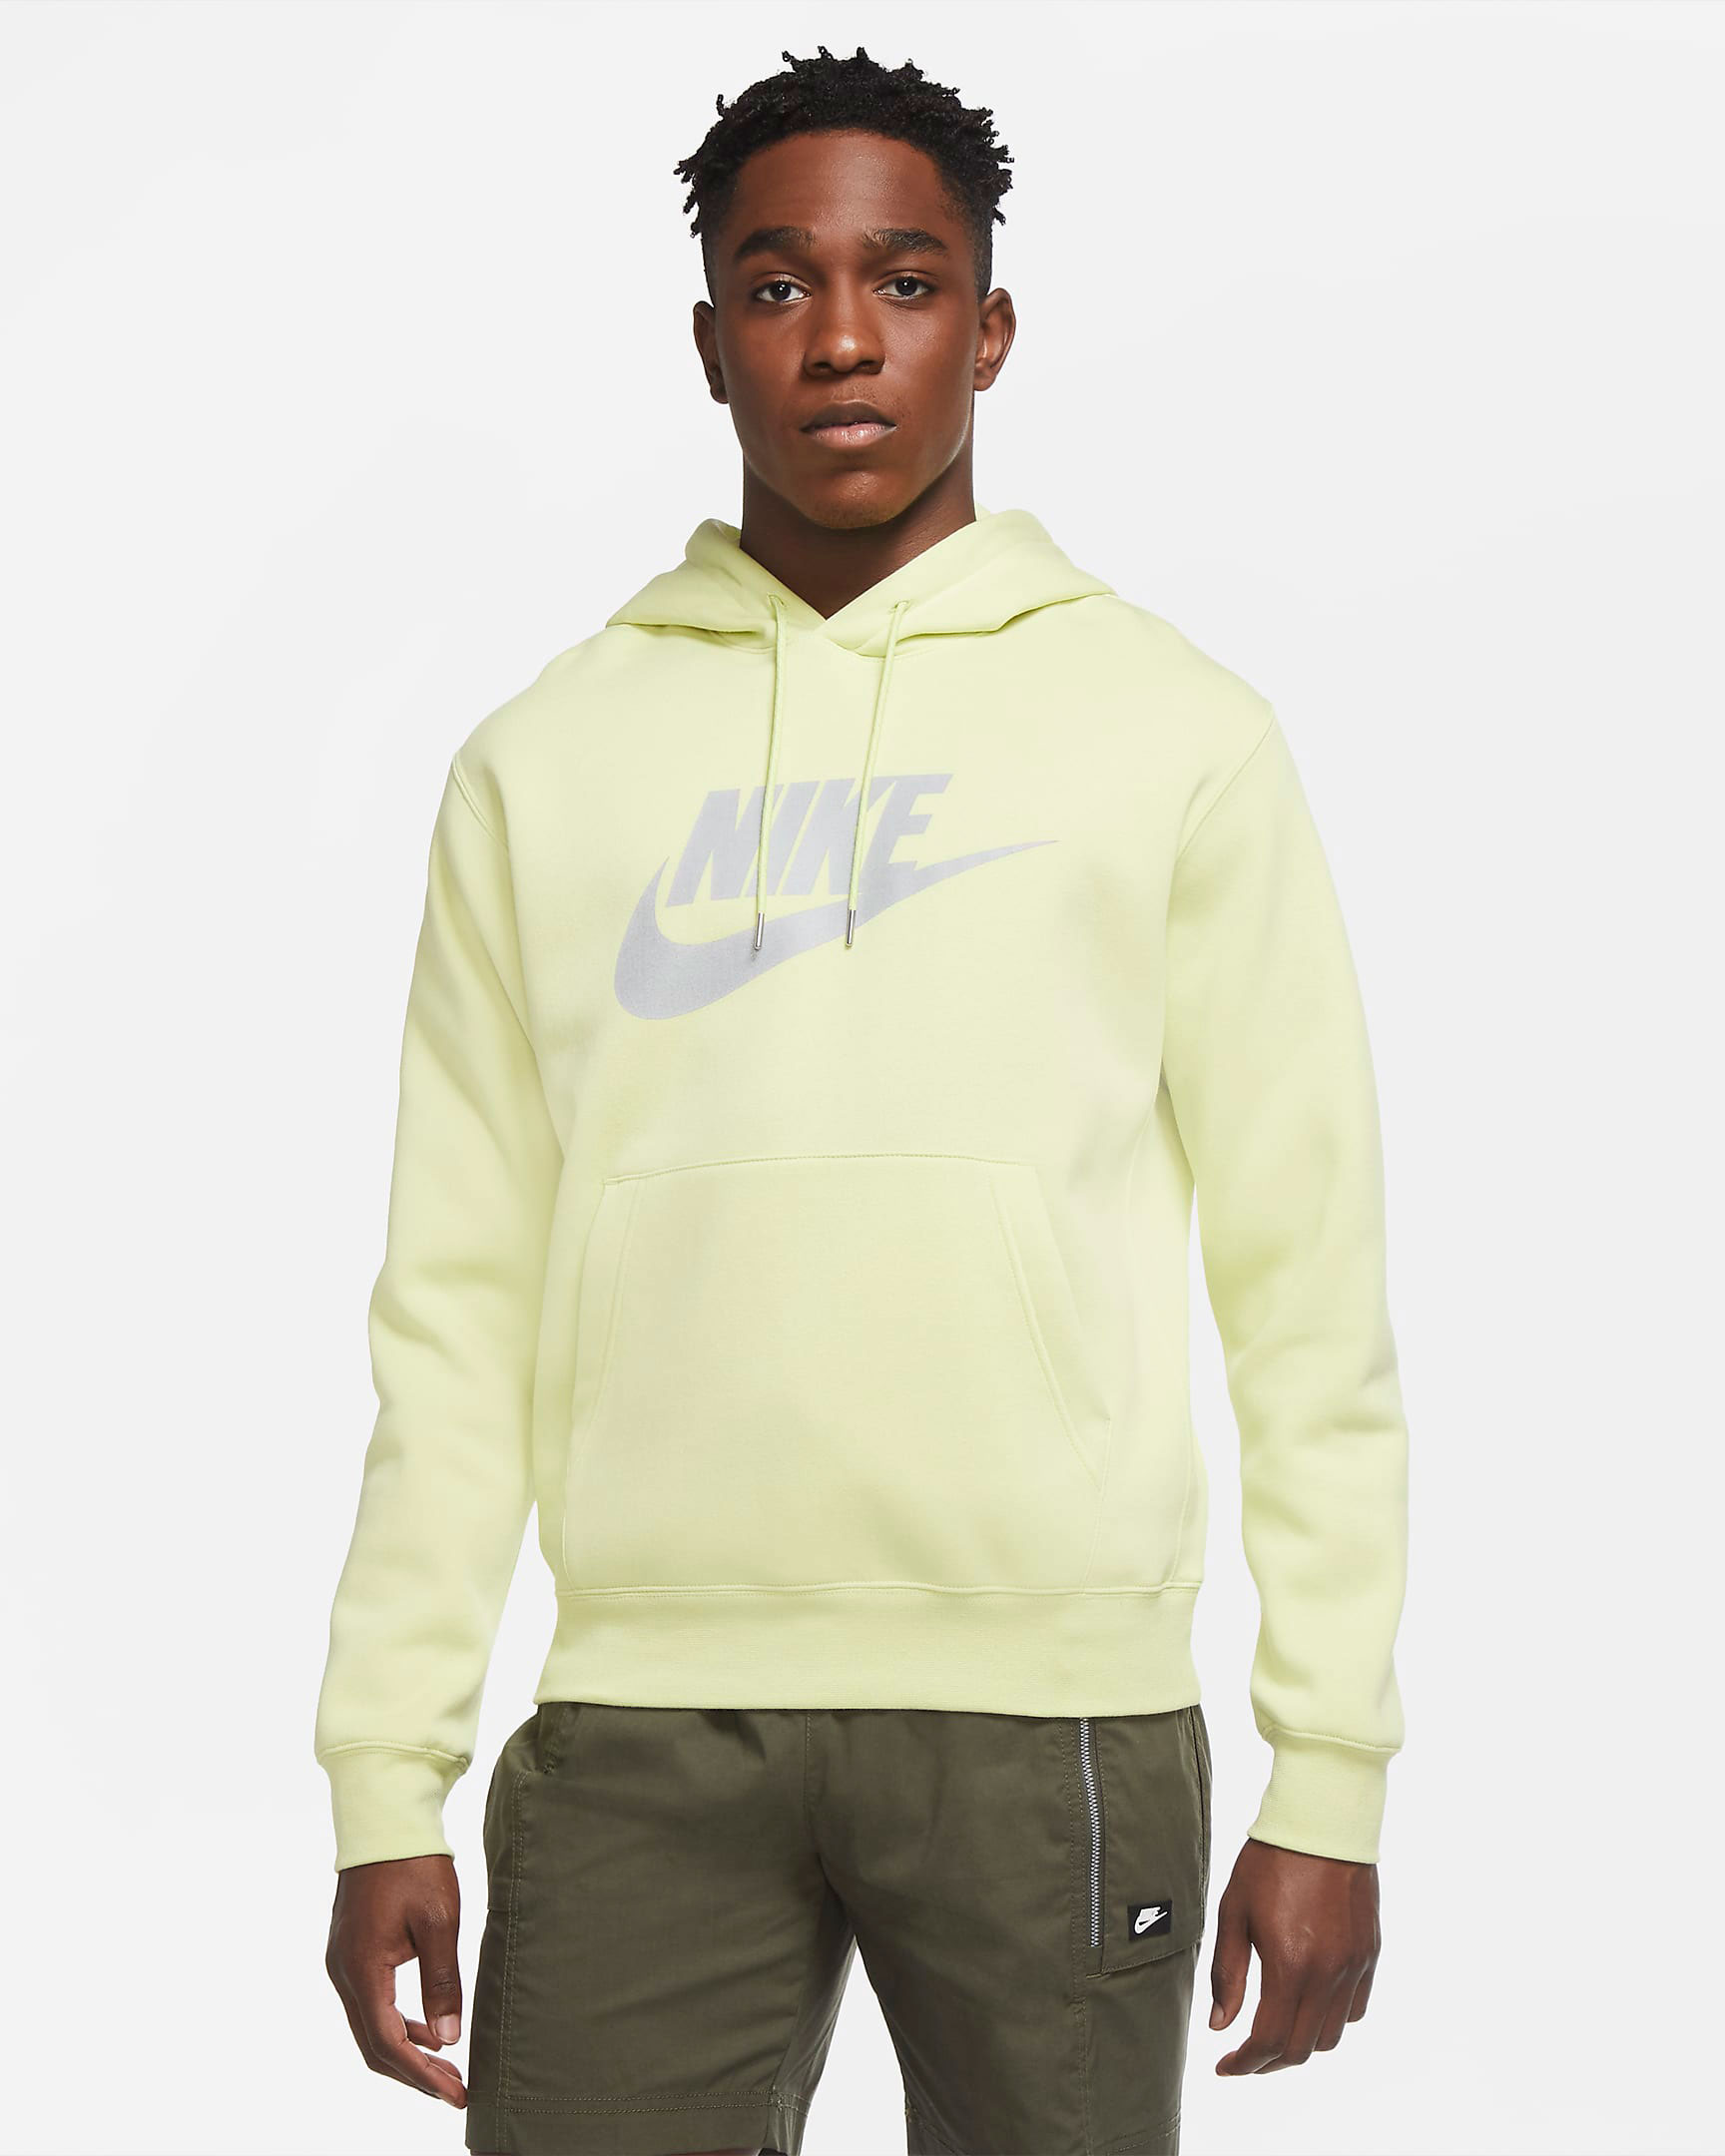 nike-air-max-95-neon-reflective-hoodie-2